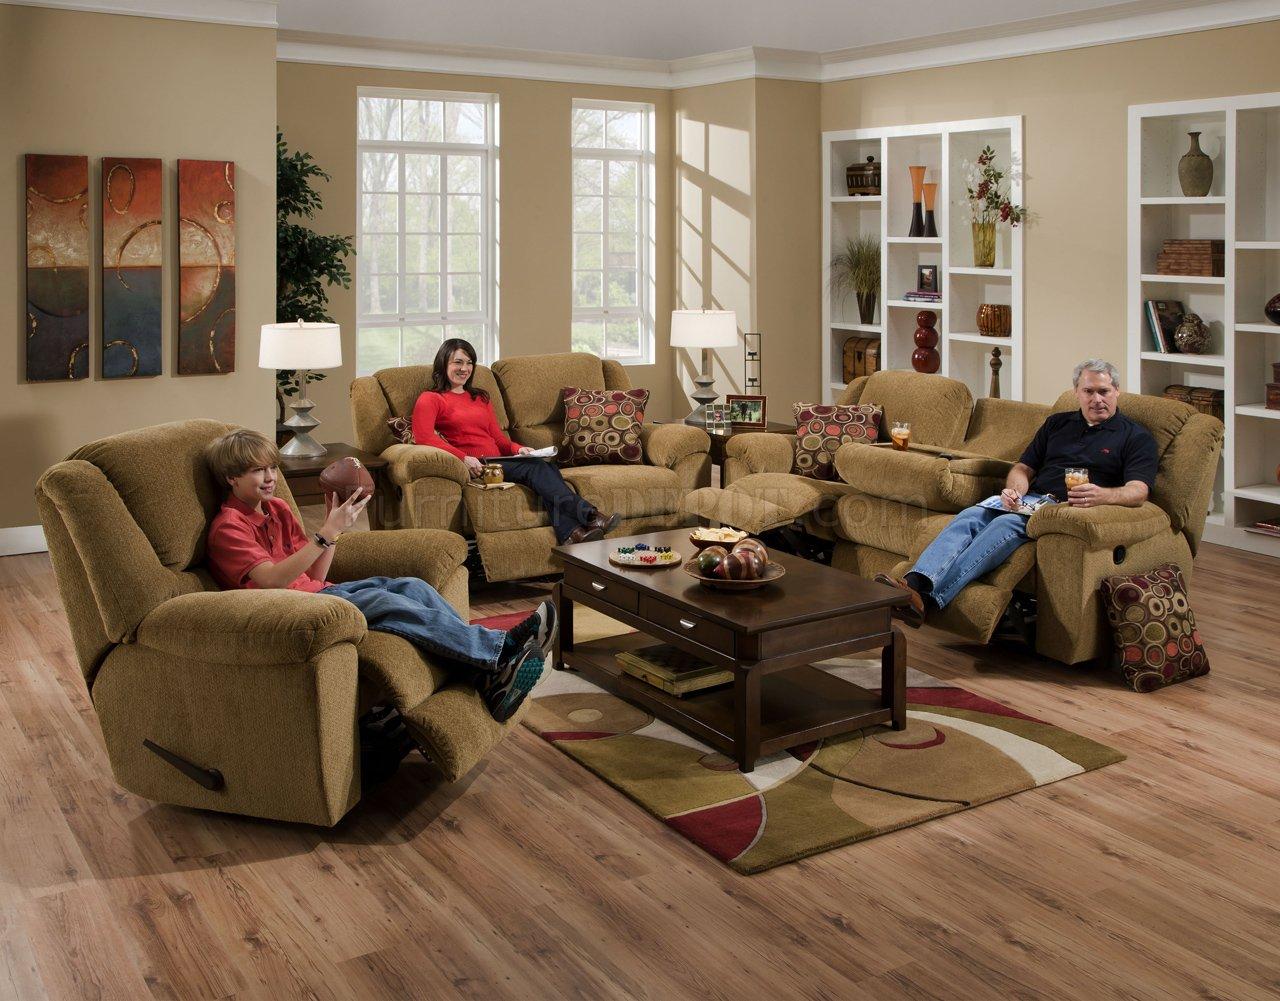 catnapper sofas and loveseats english sofa designs beige chenille fabric transformer reclining loveseat set